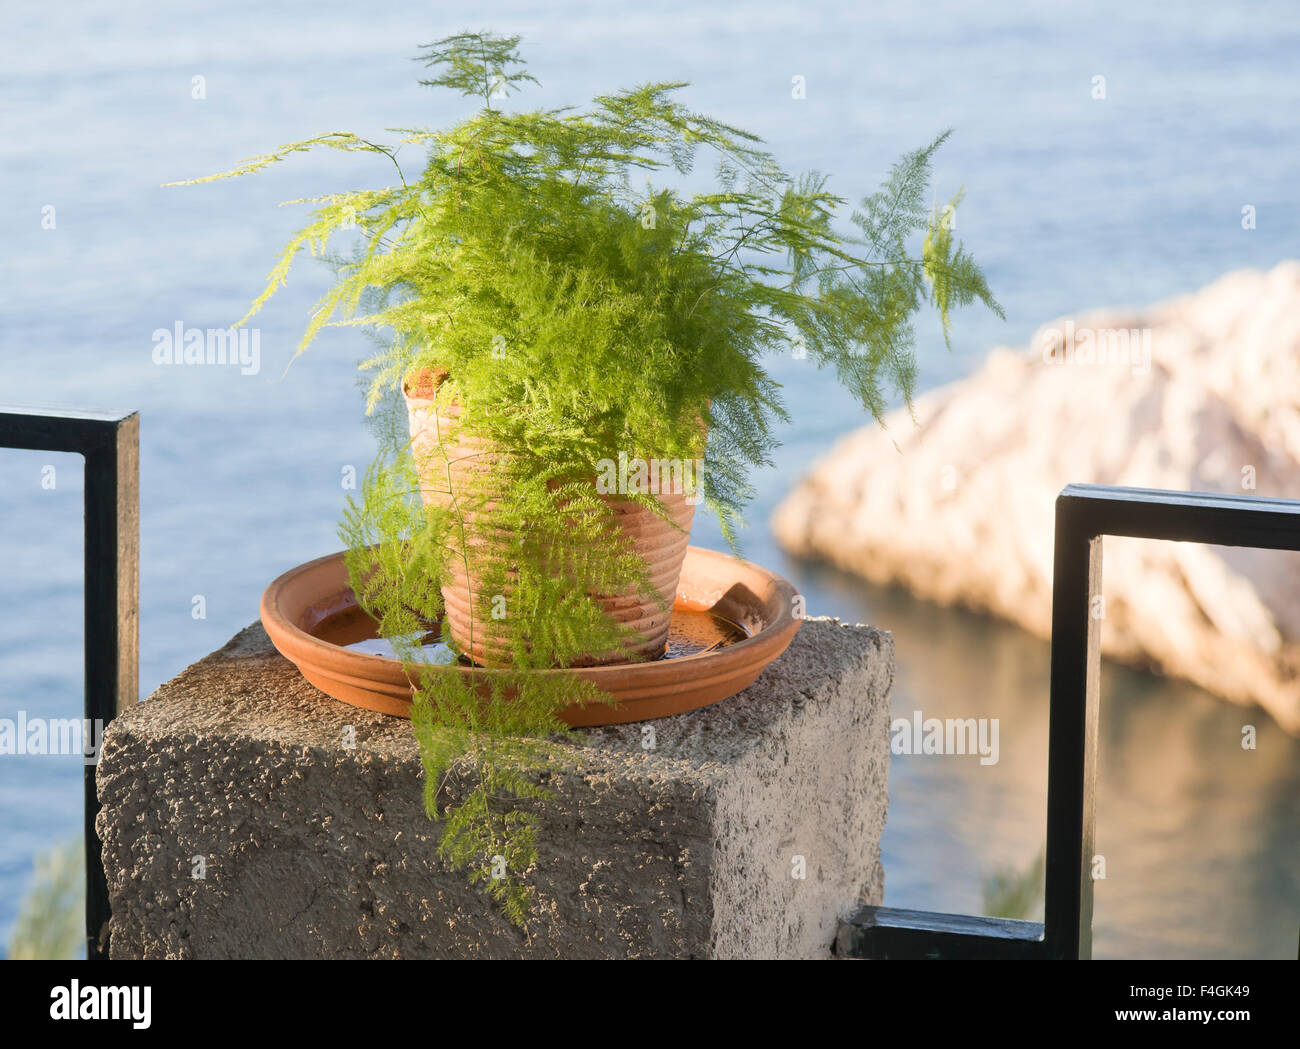 common-asparagus-fern-in-a-flowerpot-dec